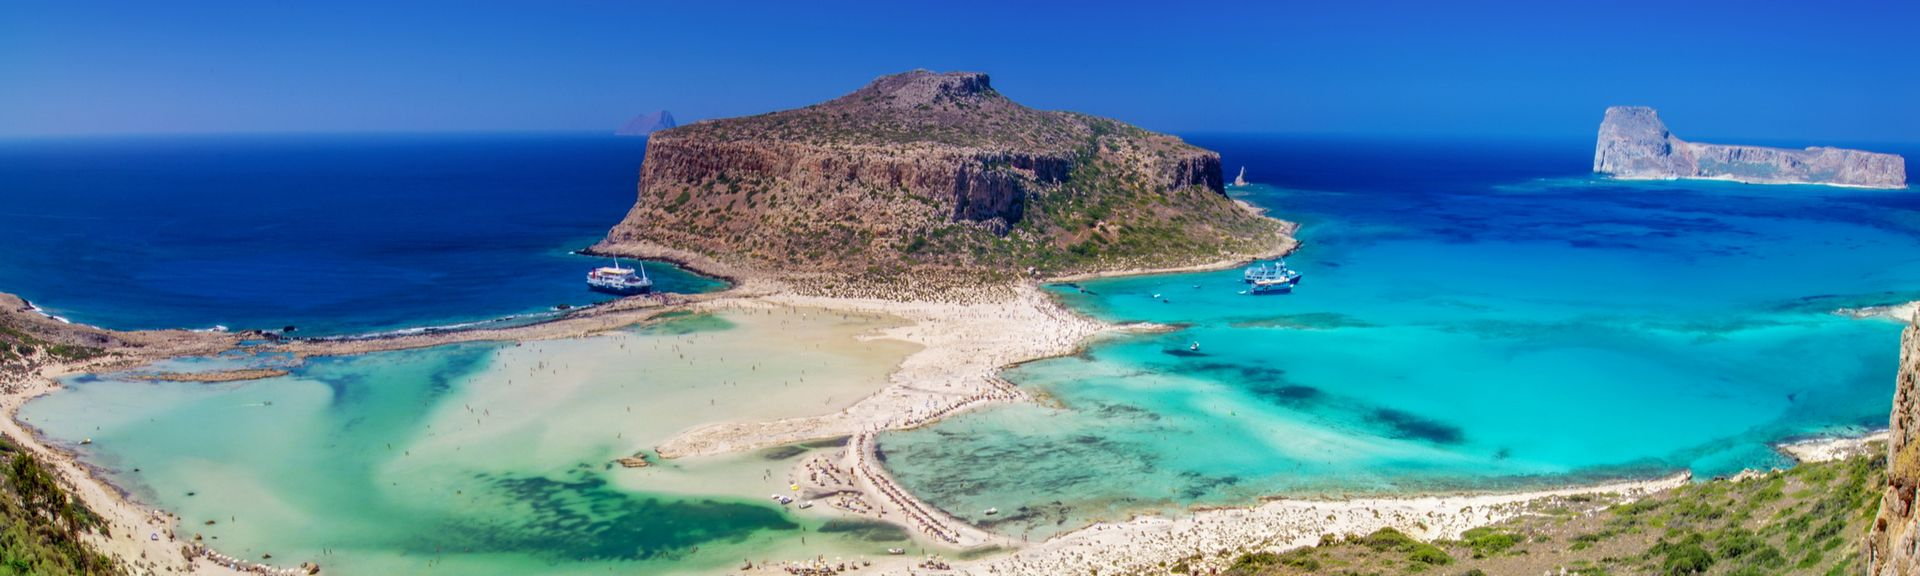 Koukounara, Kissamos, Crete, Greece